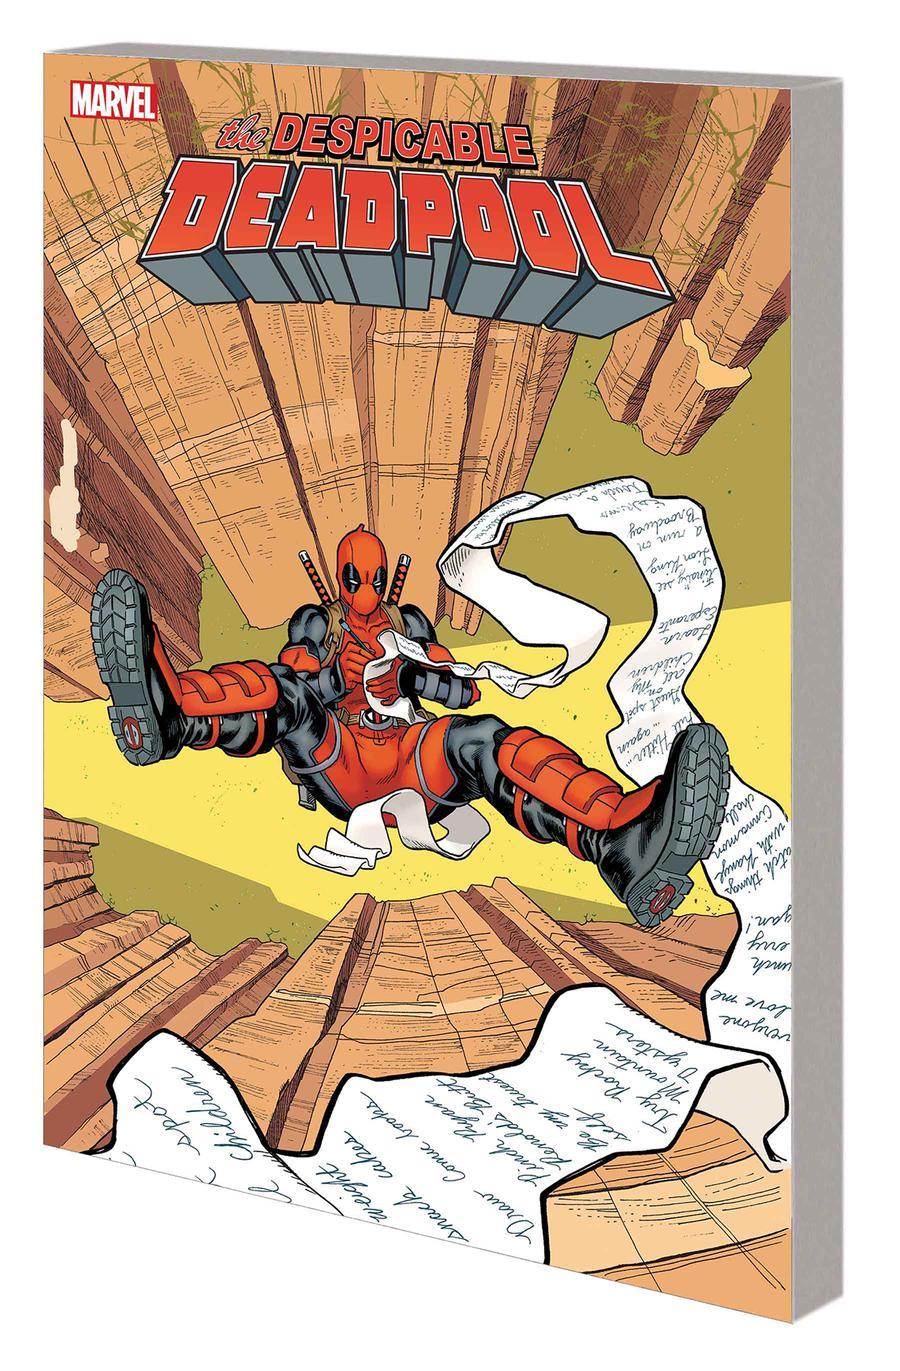 Despicable Deadpool Vol 2 Bucket List TP